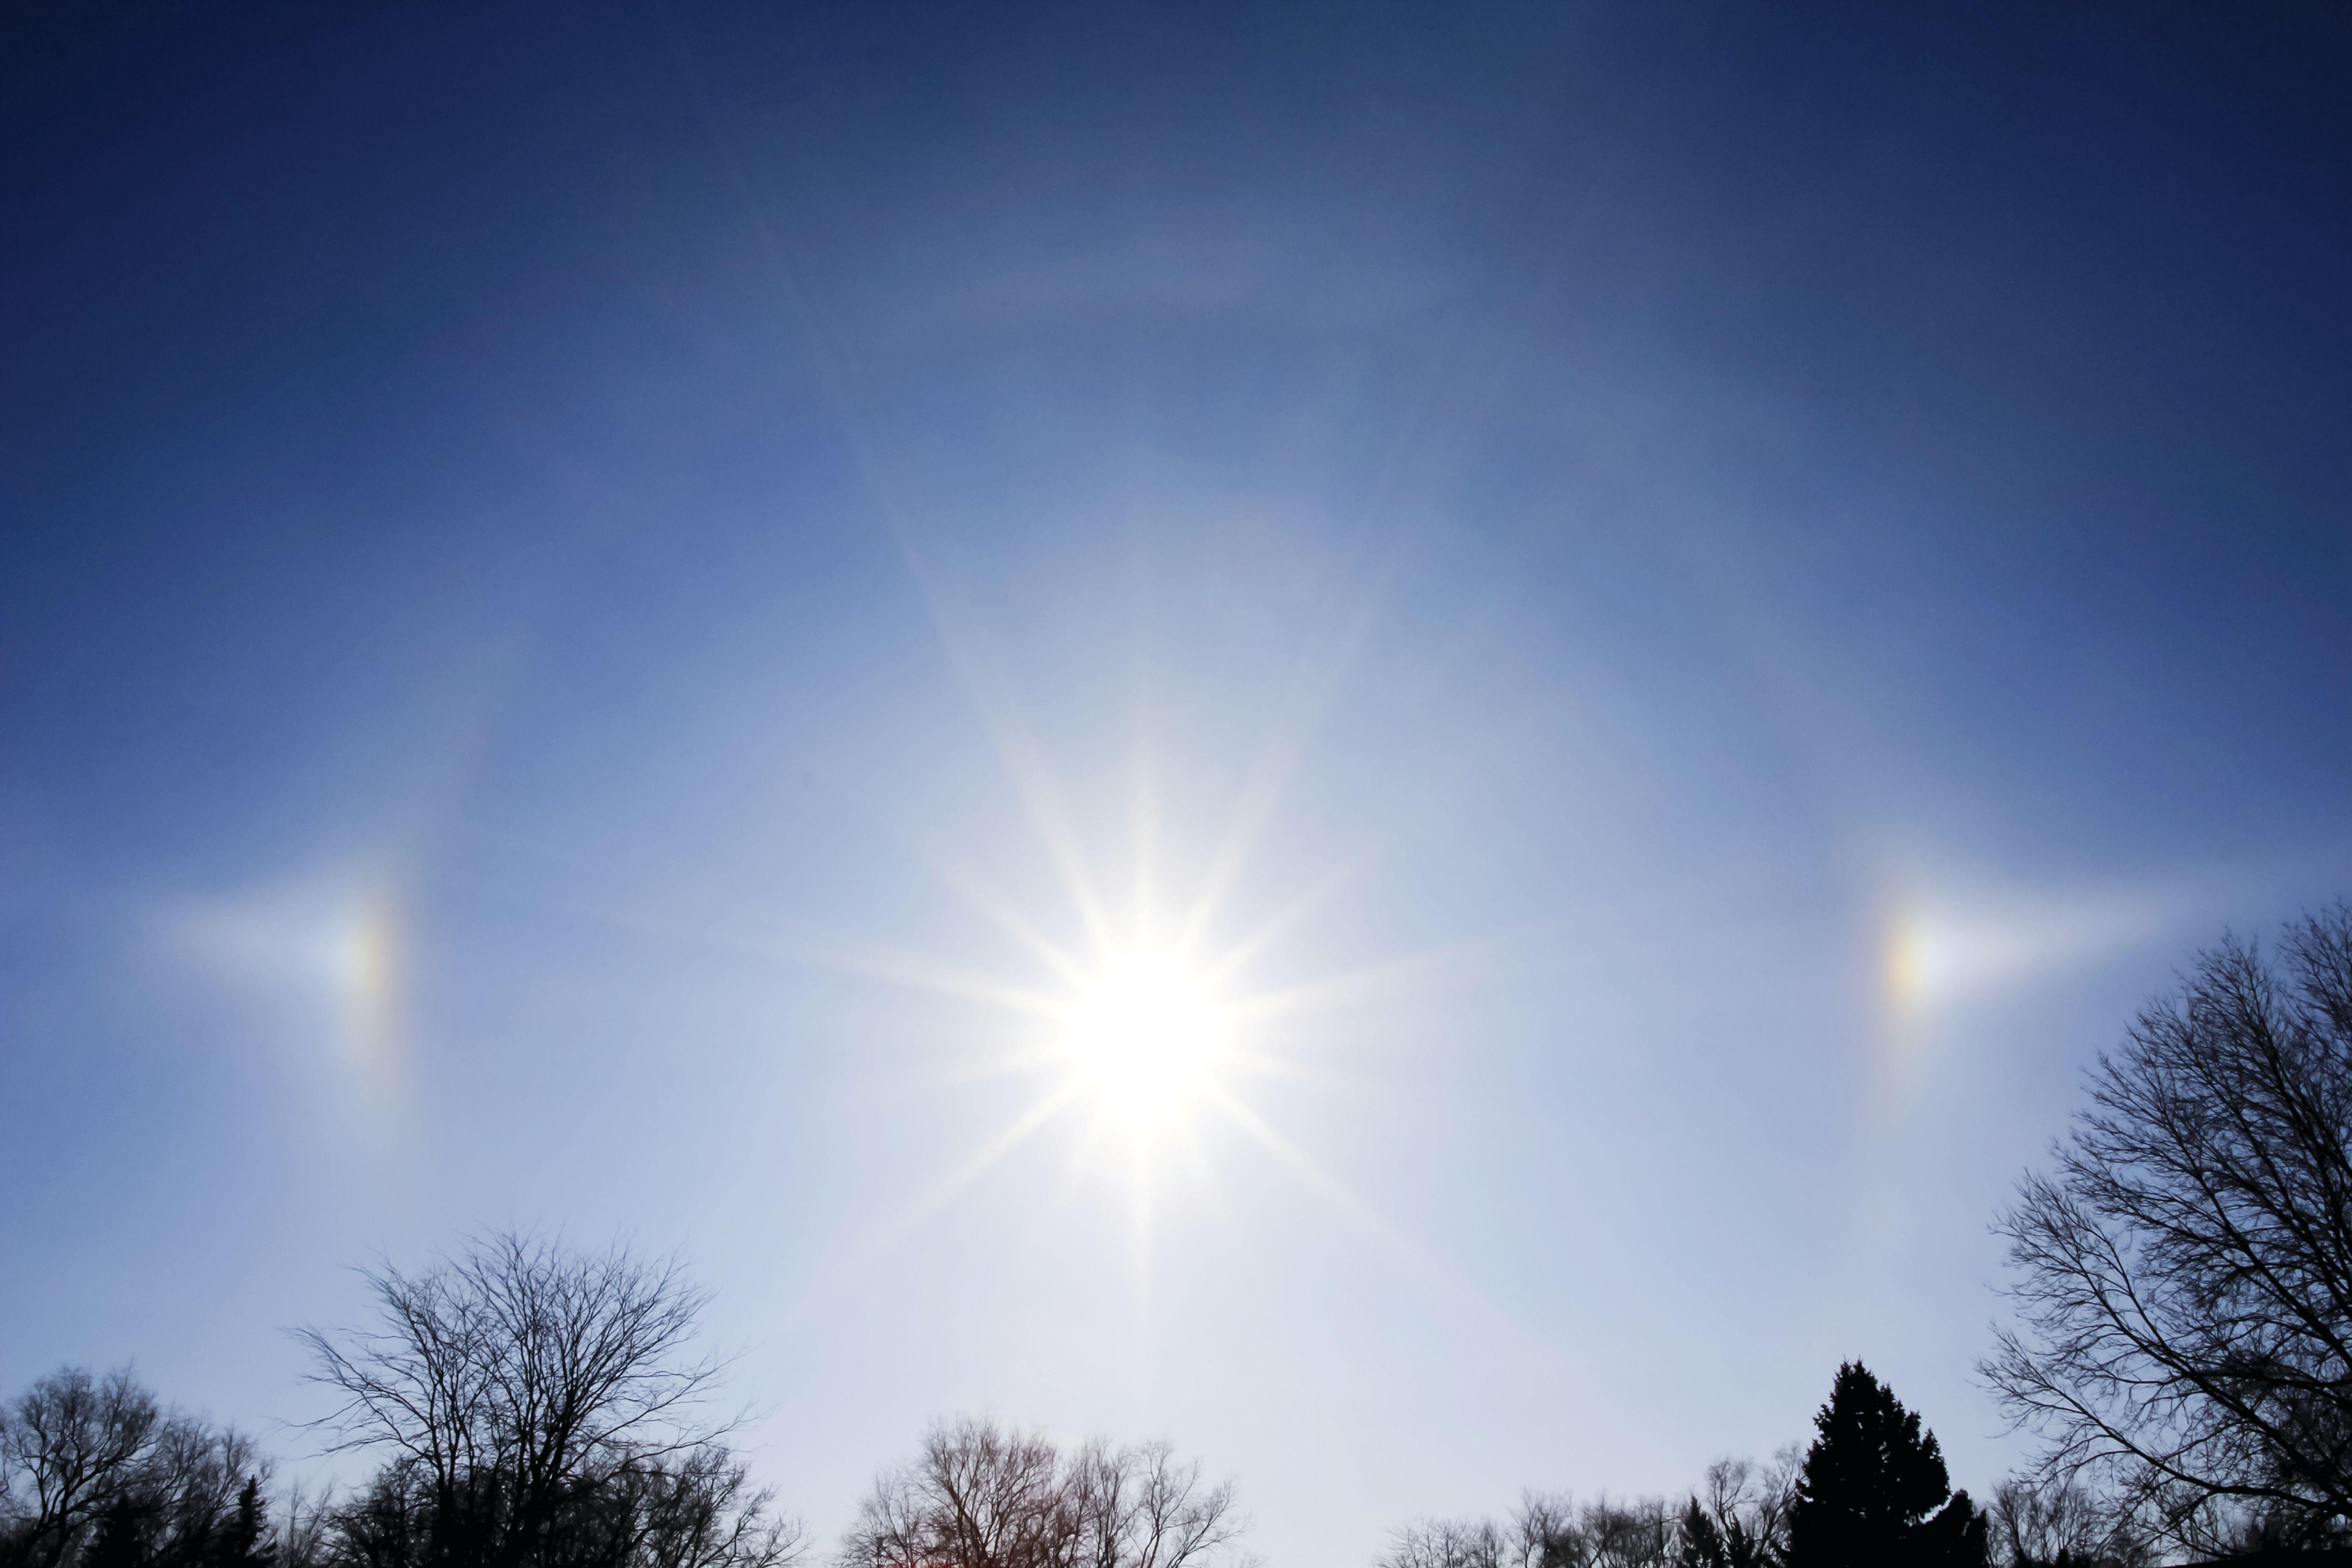 Pcwi 14 weather sun dog yyfx8d